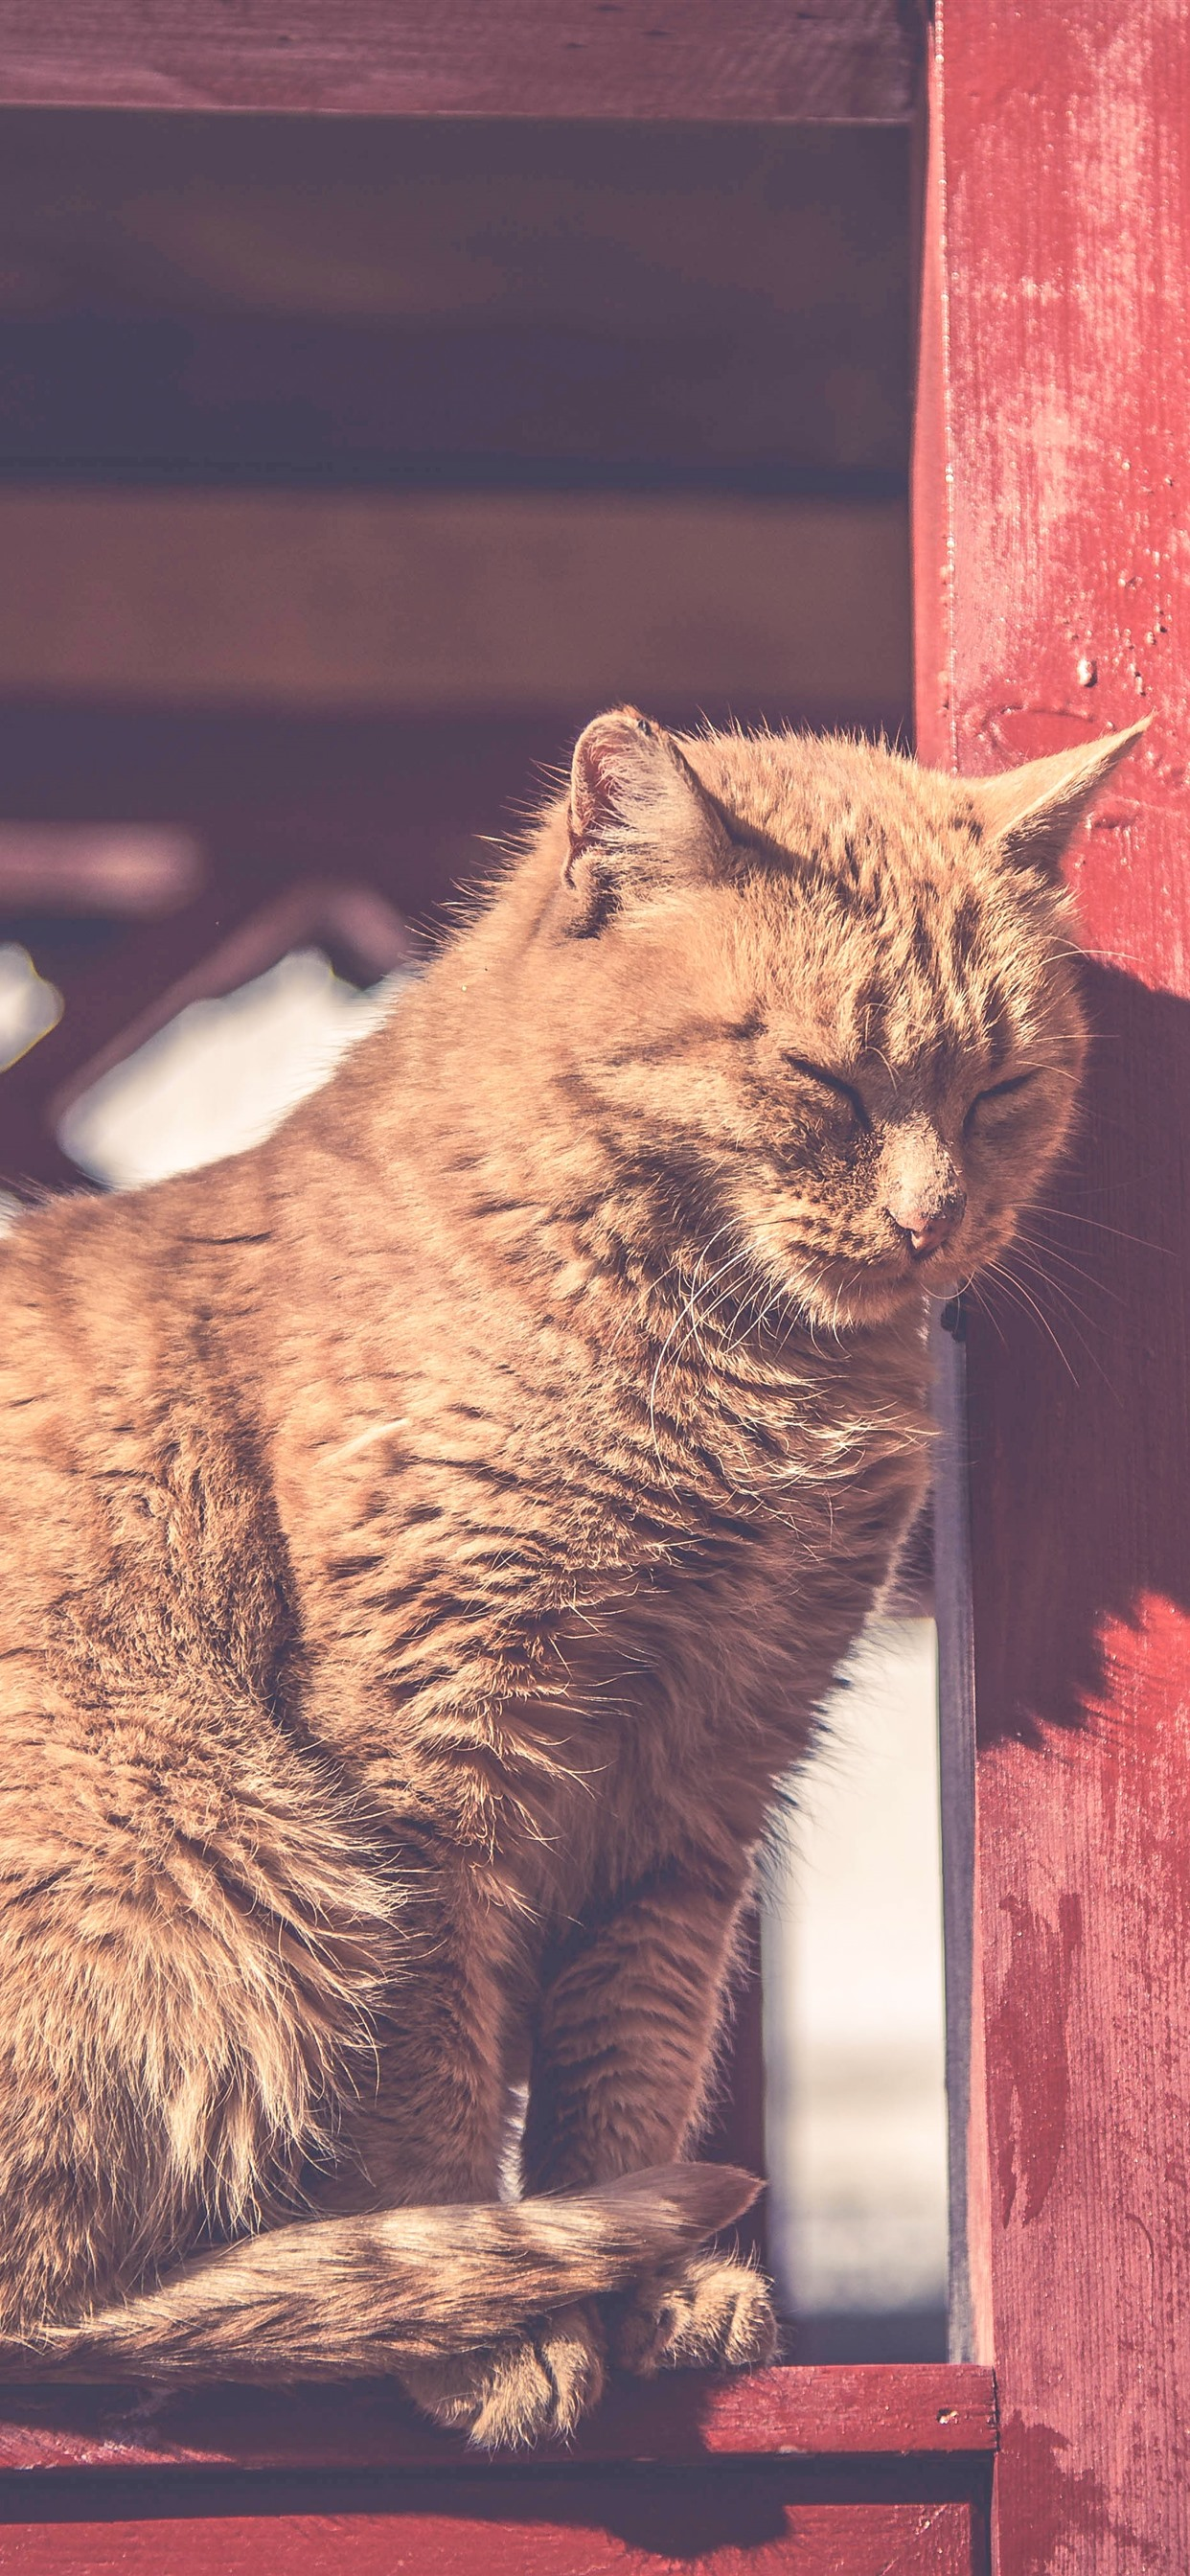 Cat Under Sunshine Rest Fence 1242x2688 Iphone Xs Max